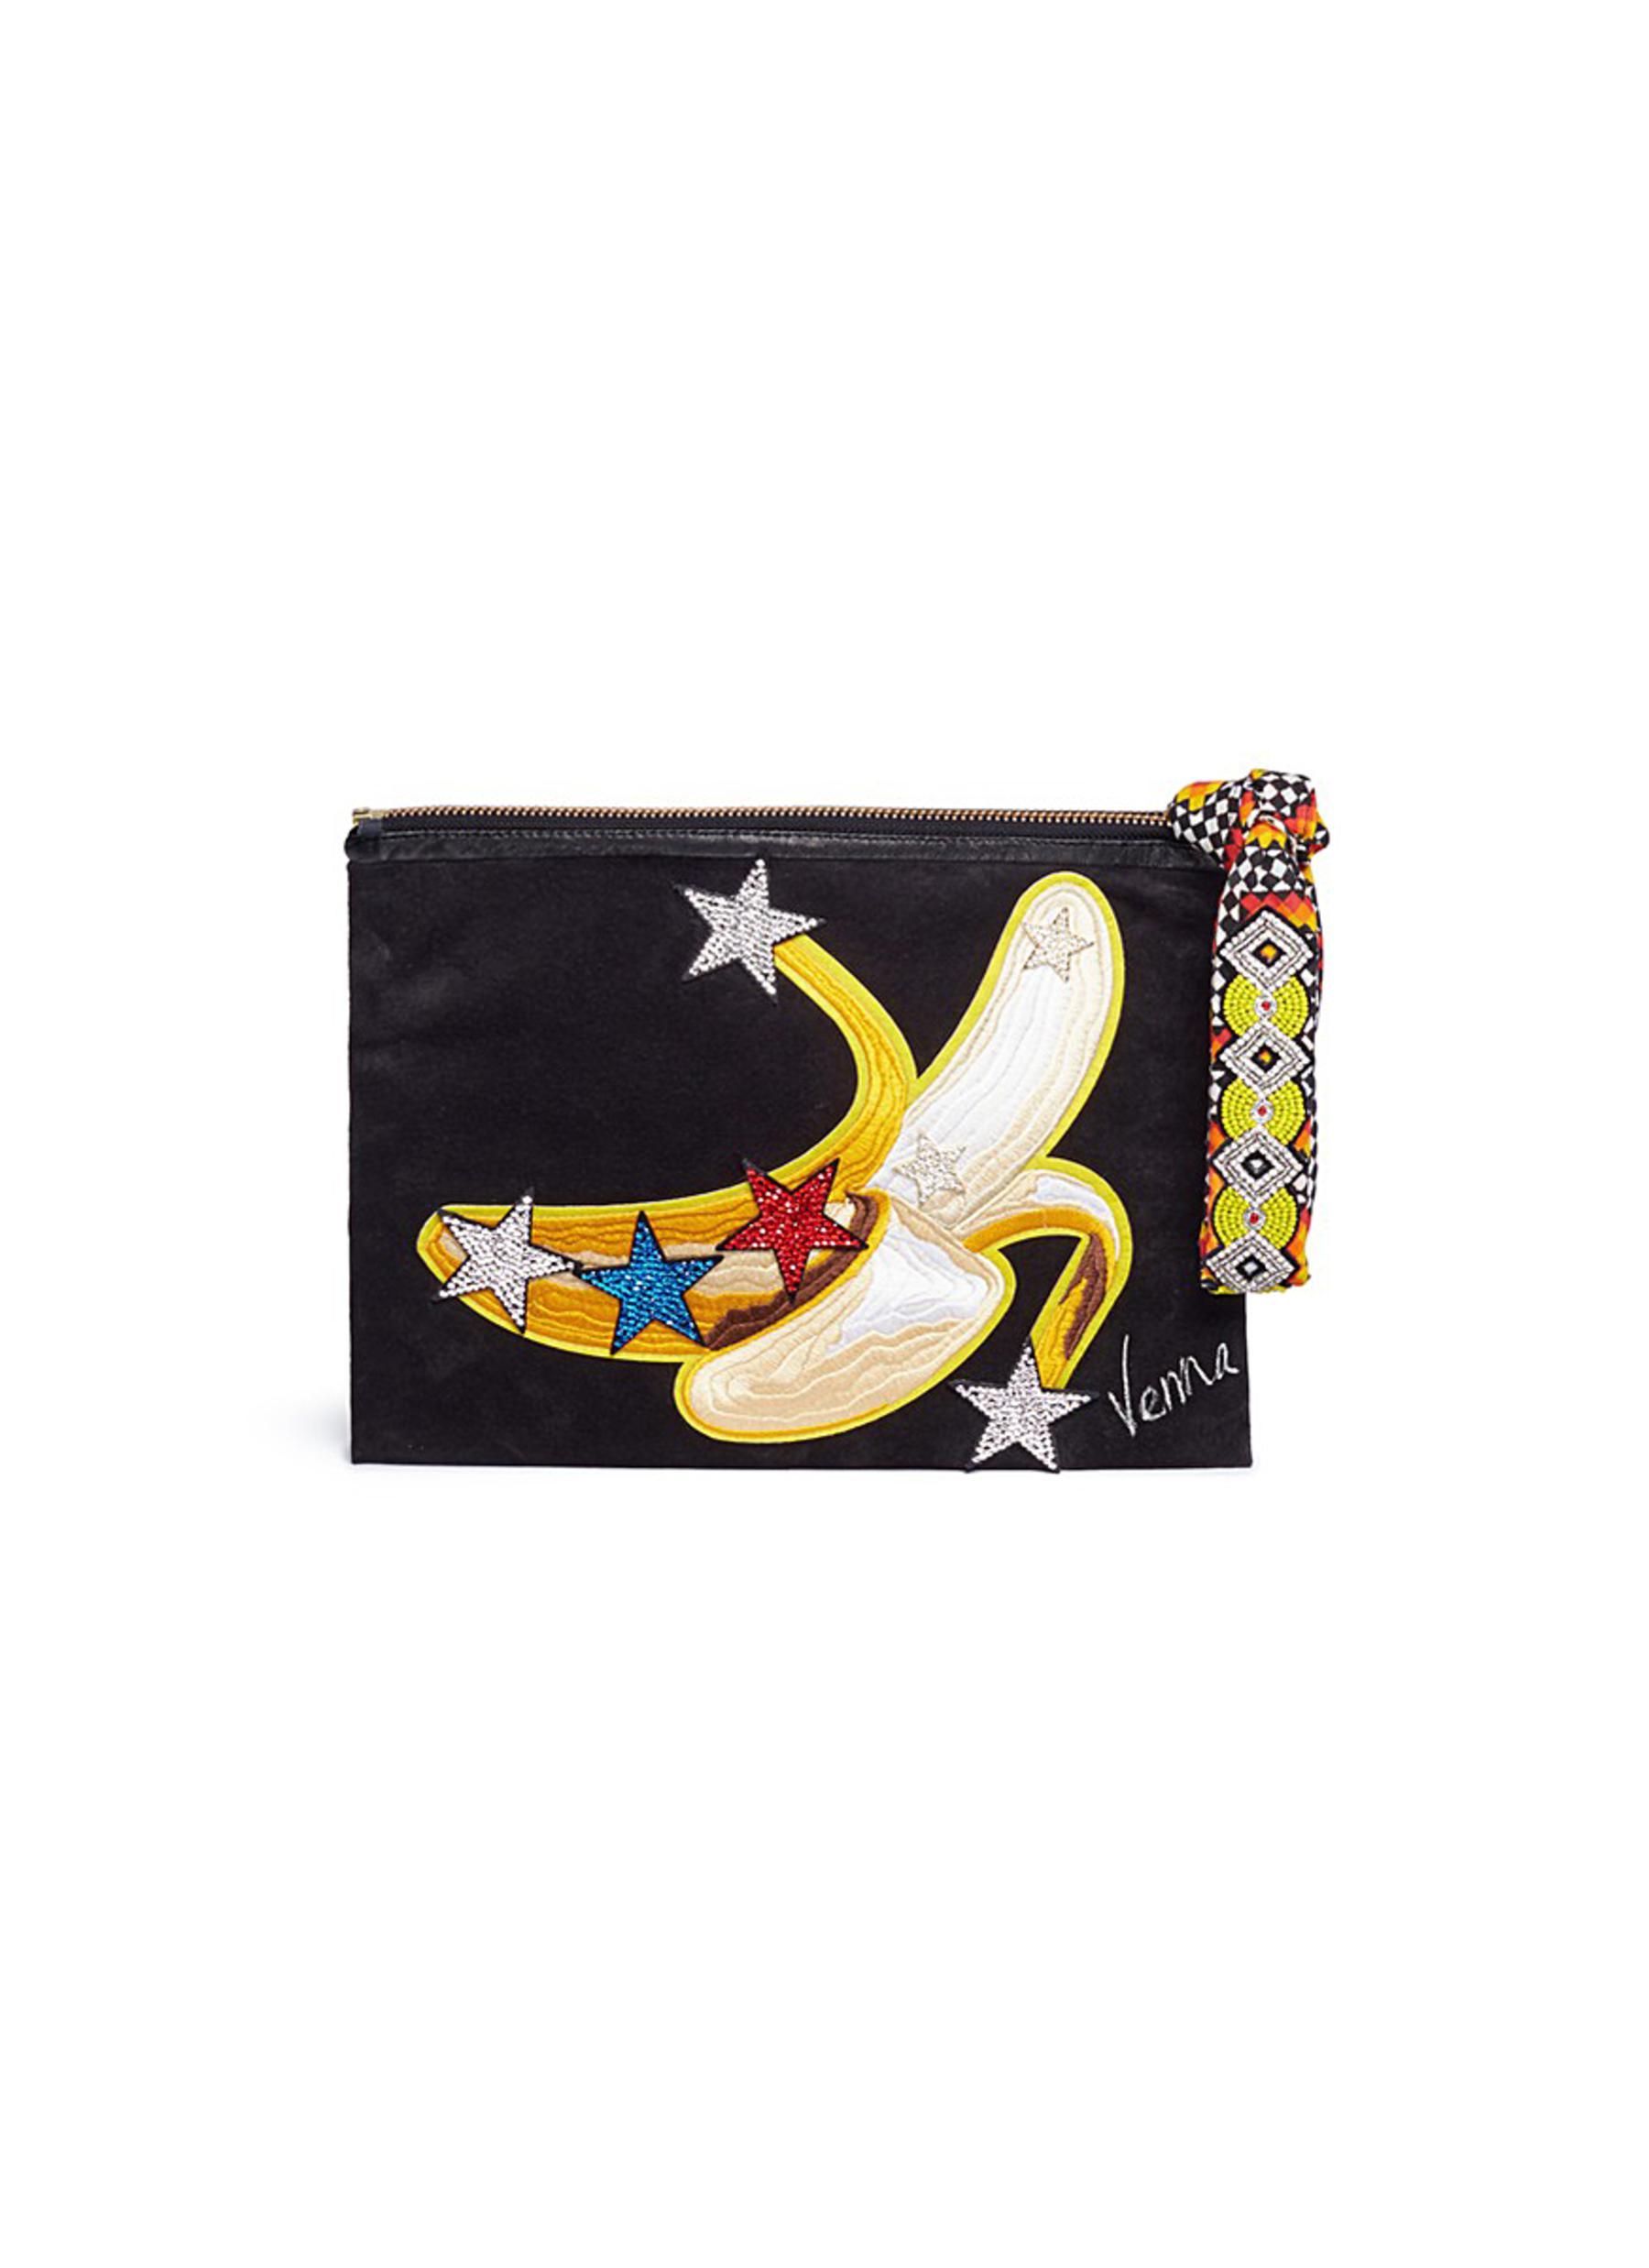 VENNA Banana Appliqué Star Patch Suede Clutch